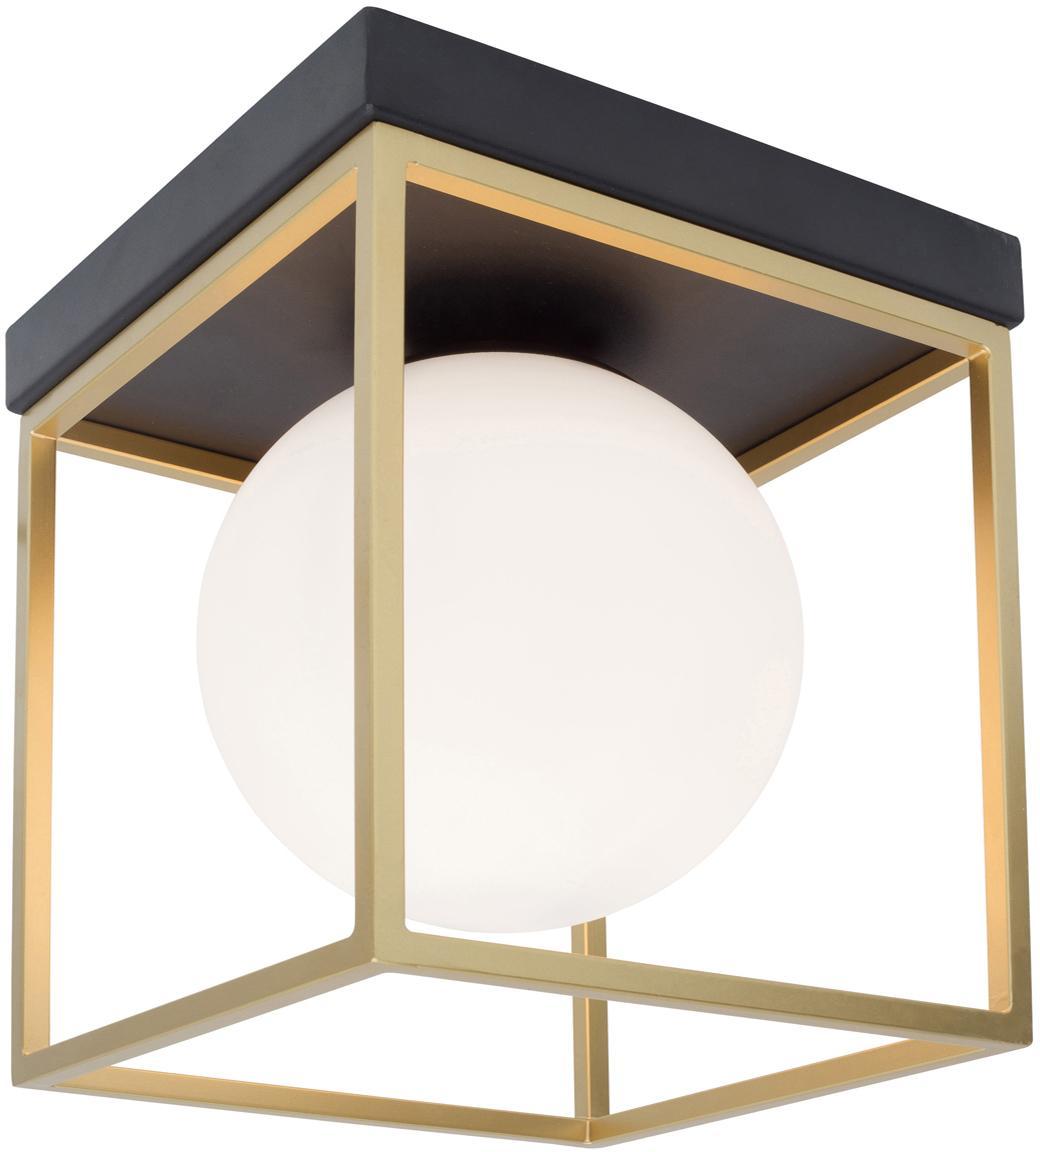 Plafondlamp Juliet, Lampenkap: glas, Frame: vermessingd metaal, Wit, messingkleurig, 19 x 20 cm